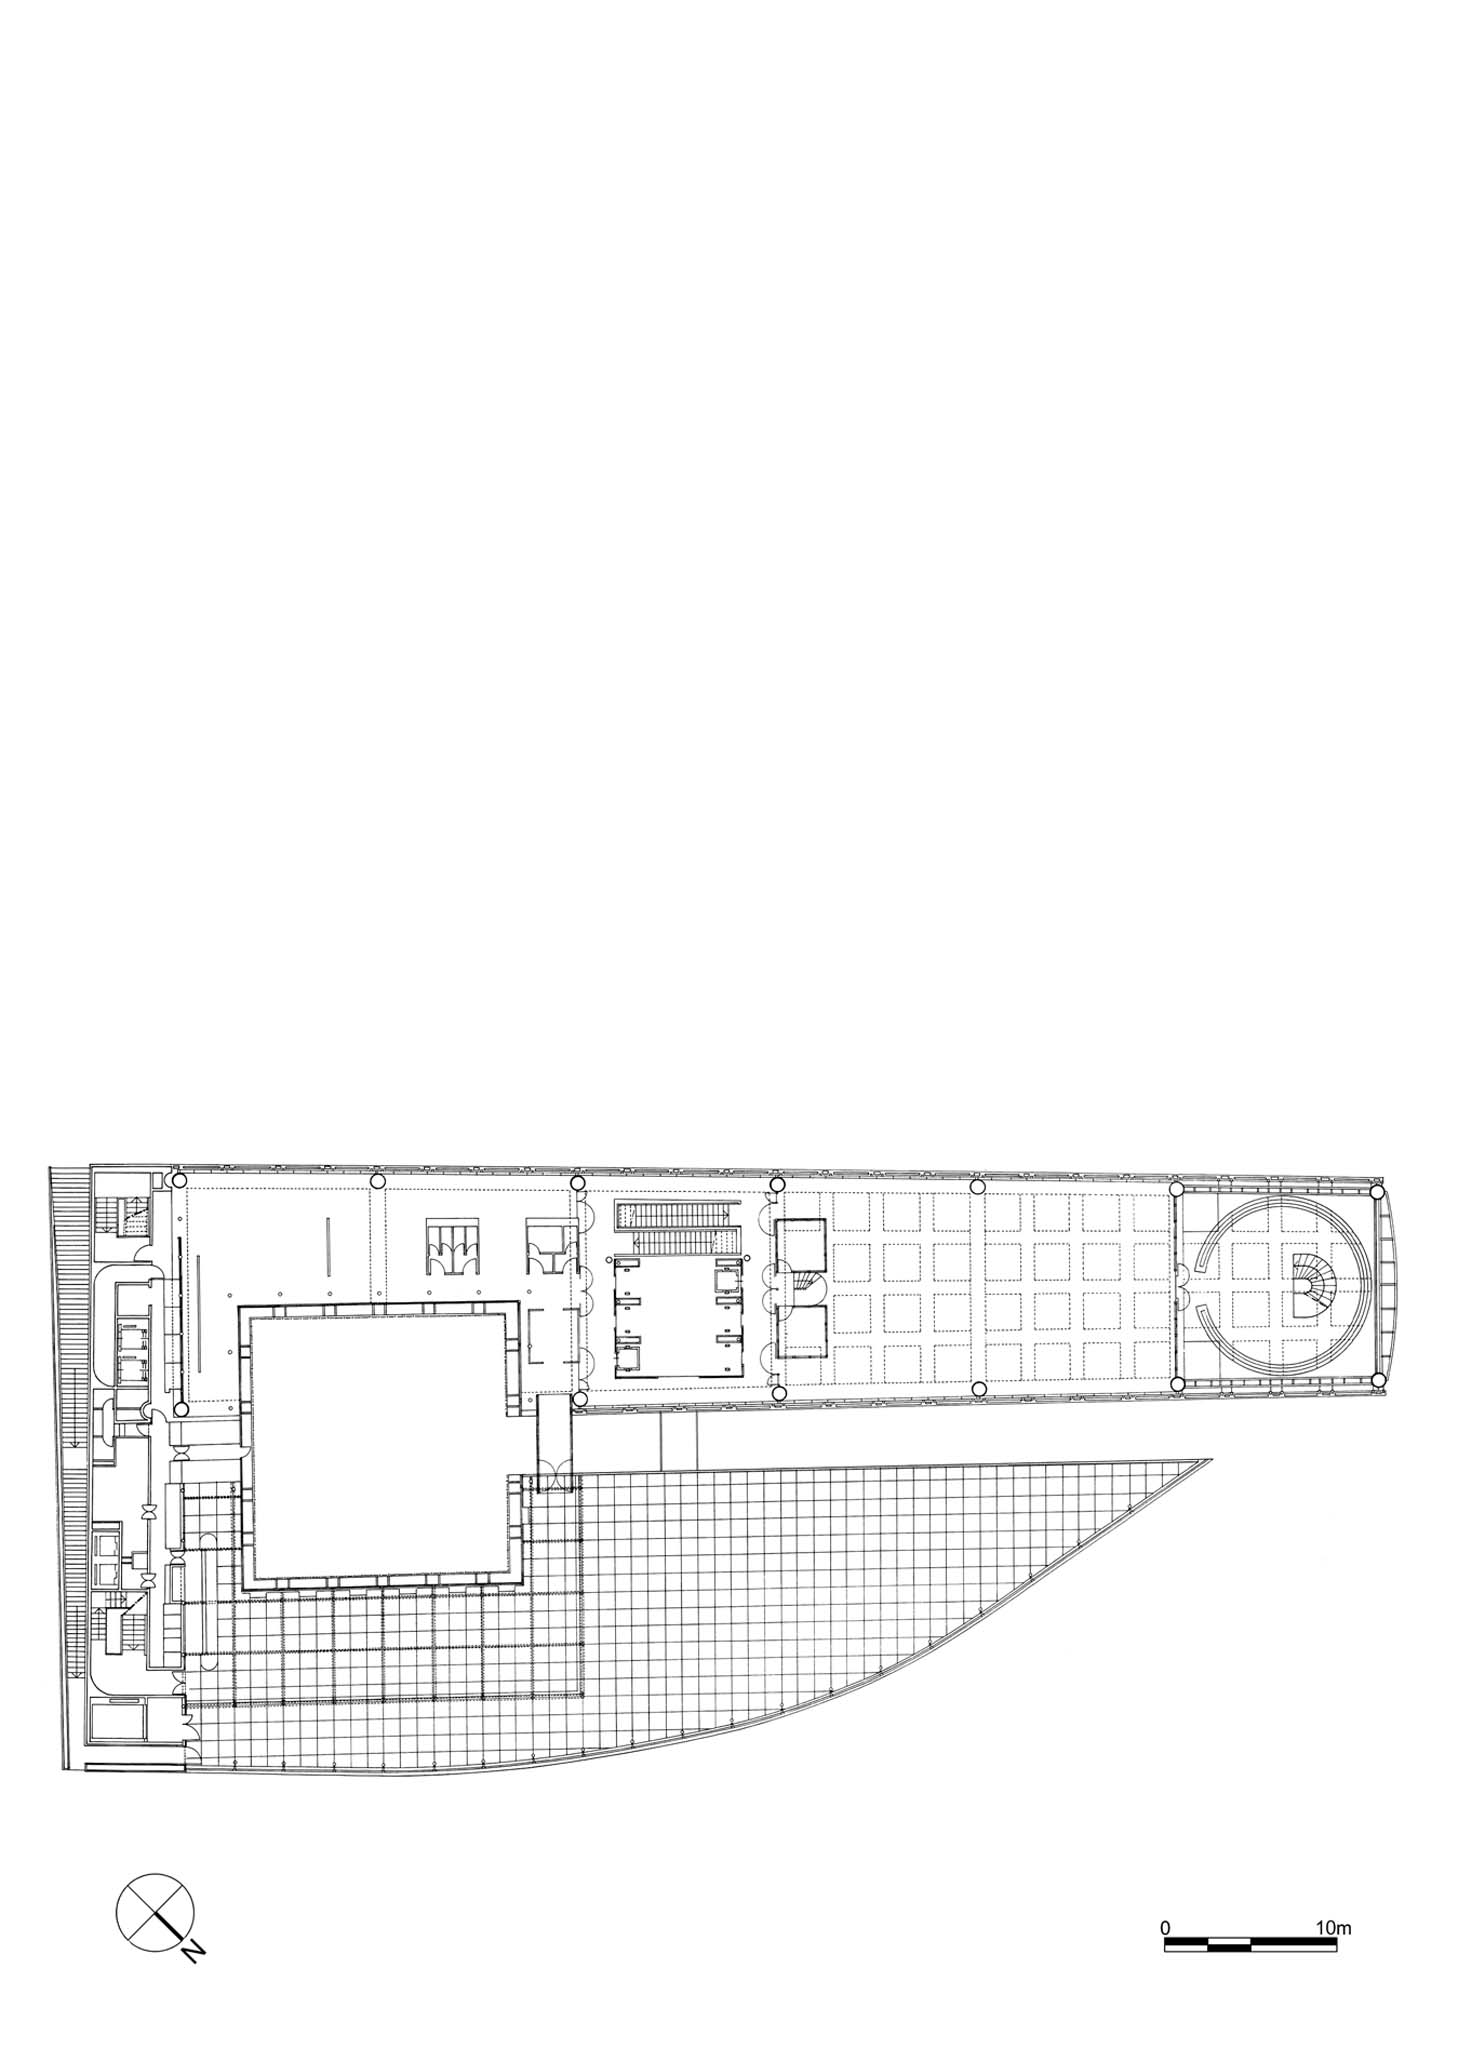 equerre design plan de travail affordable simple equerre design plan de travail nomin l uquerre. Black Bedroom Furniture Sets. Home Design Ideas